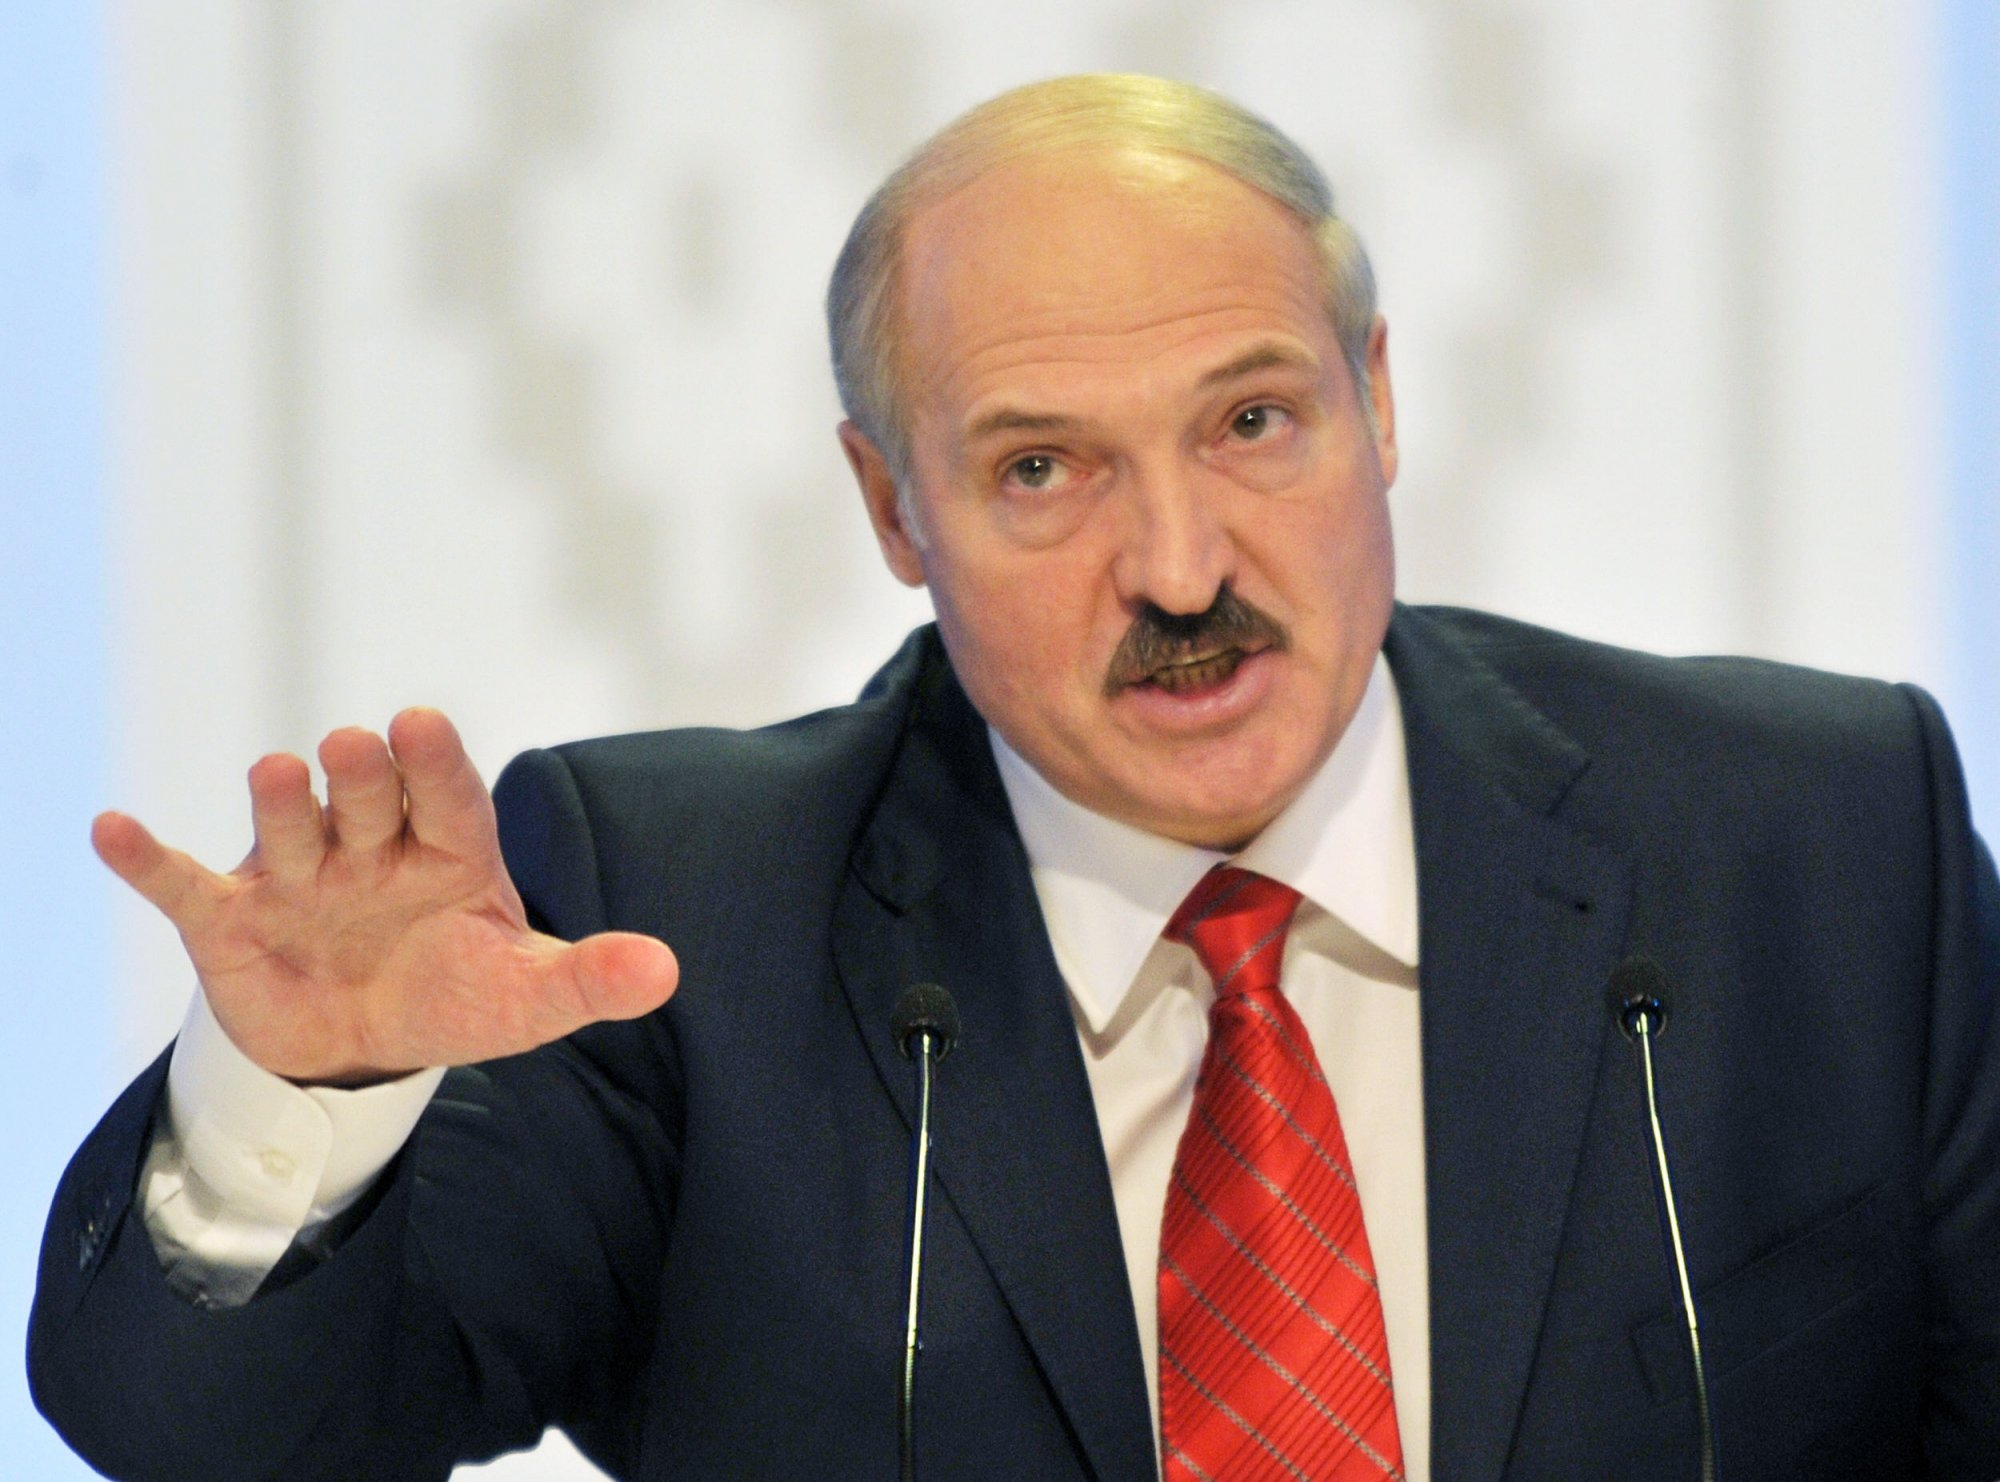 Лукашенко александр григорьевич видео фото 724-26